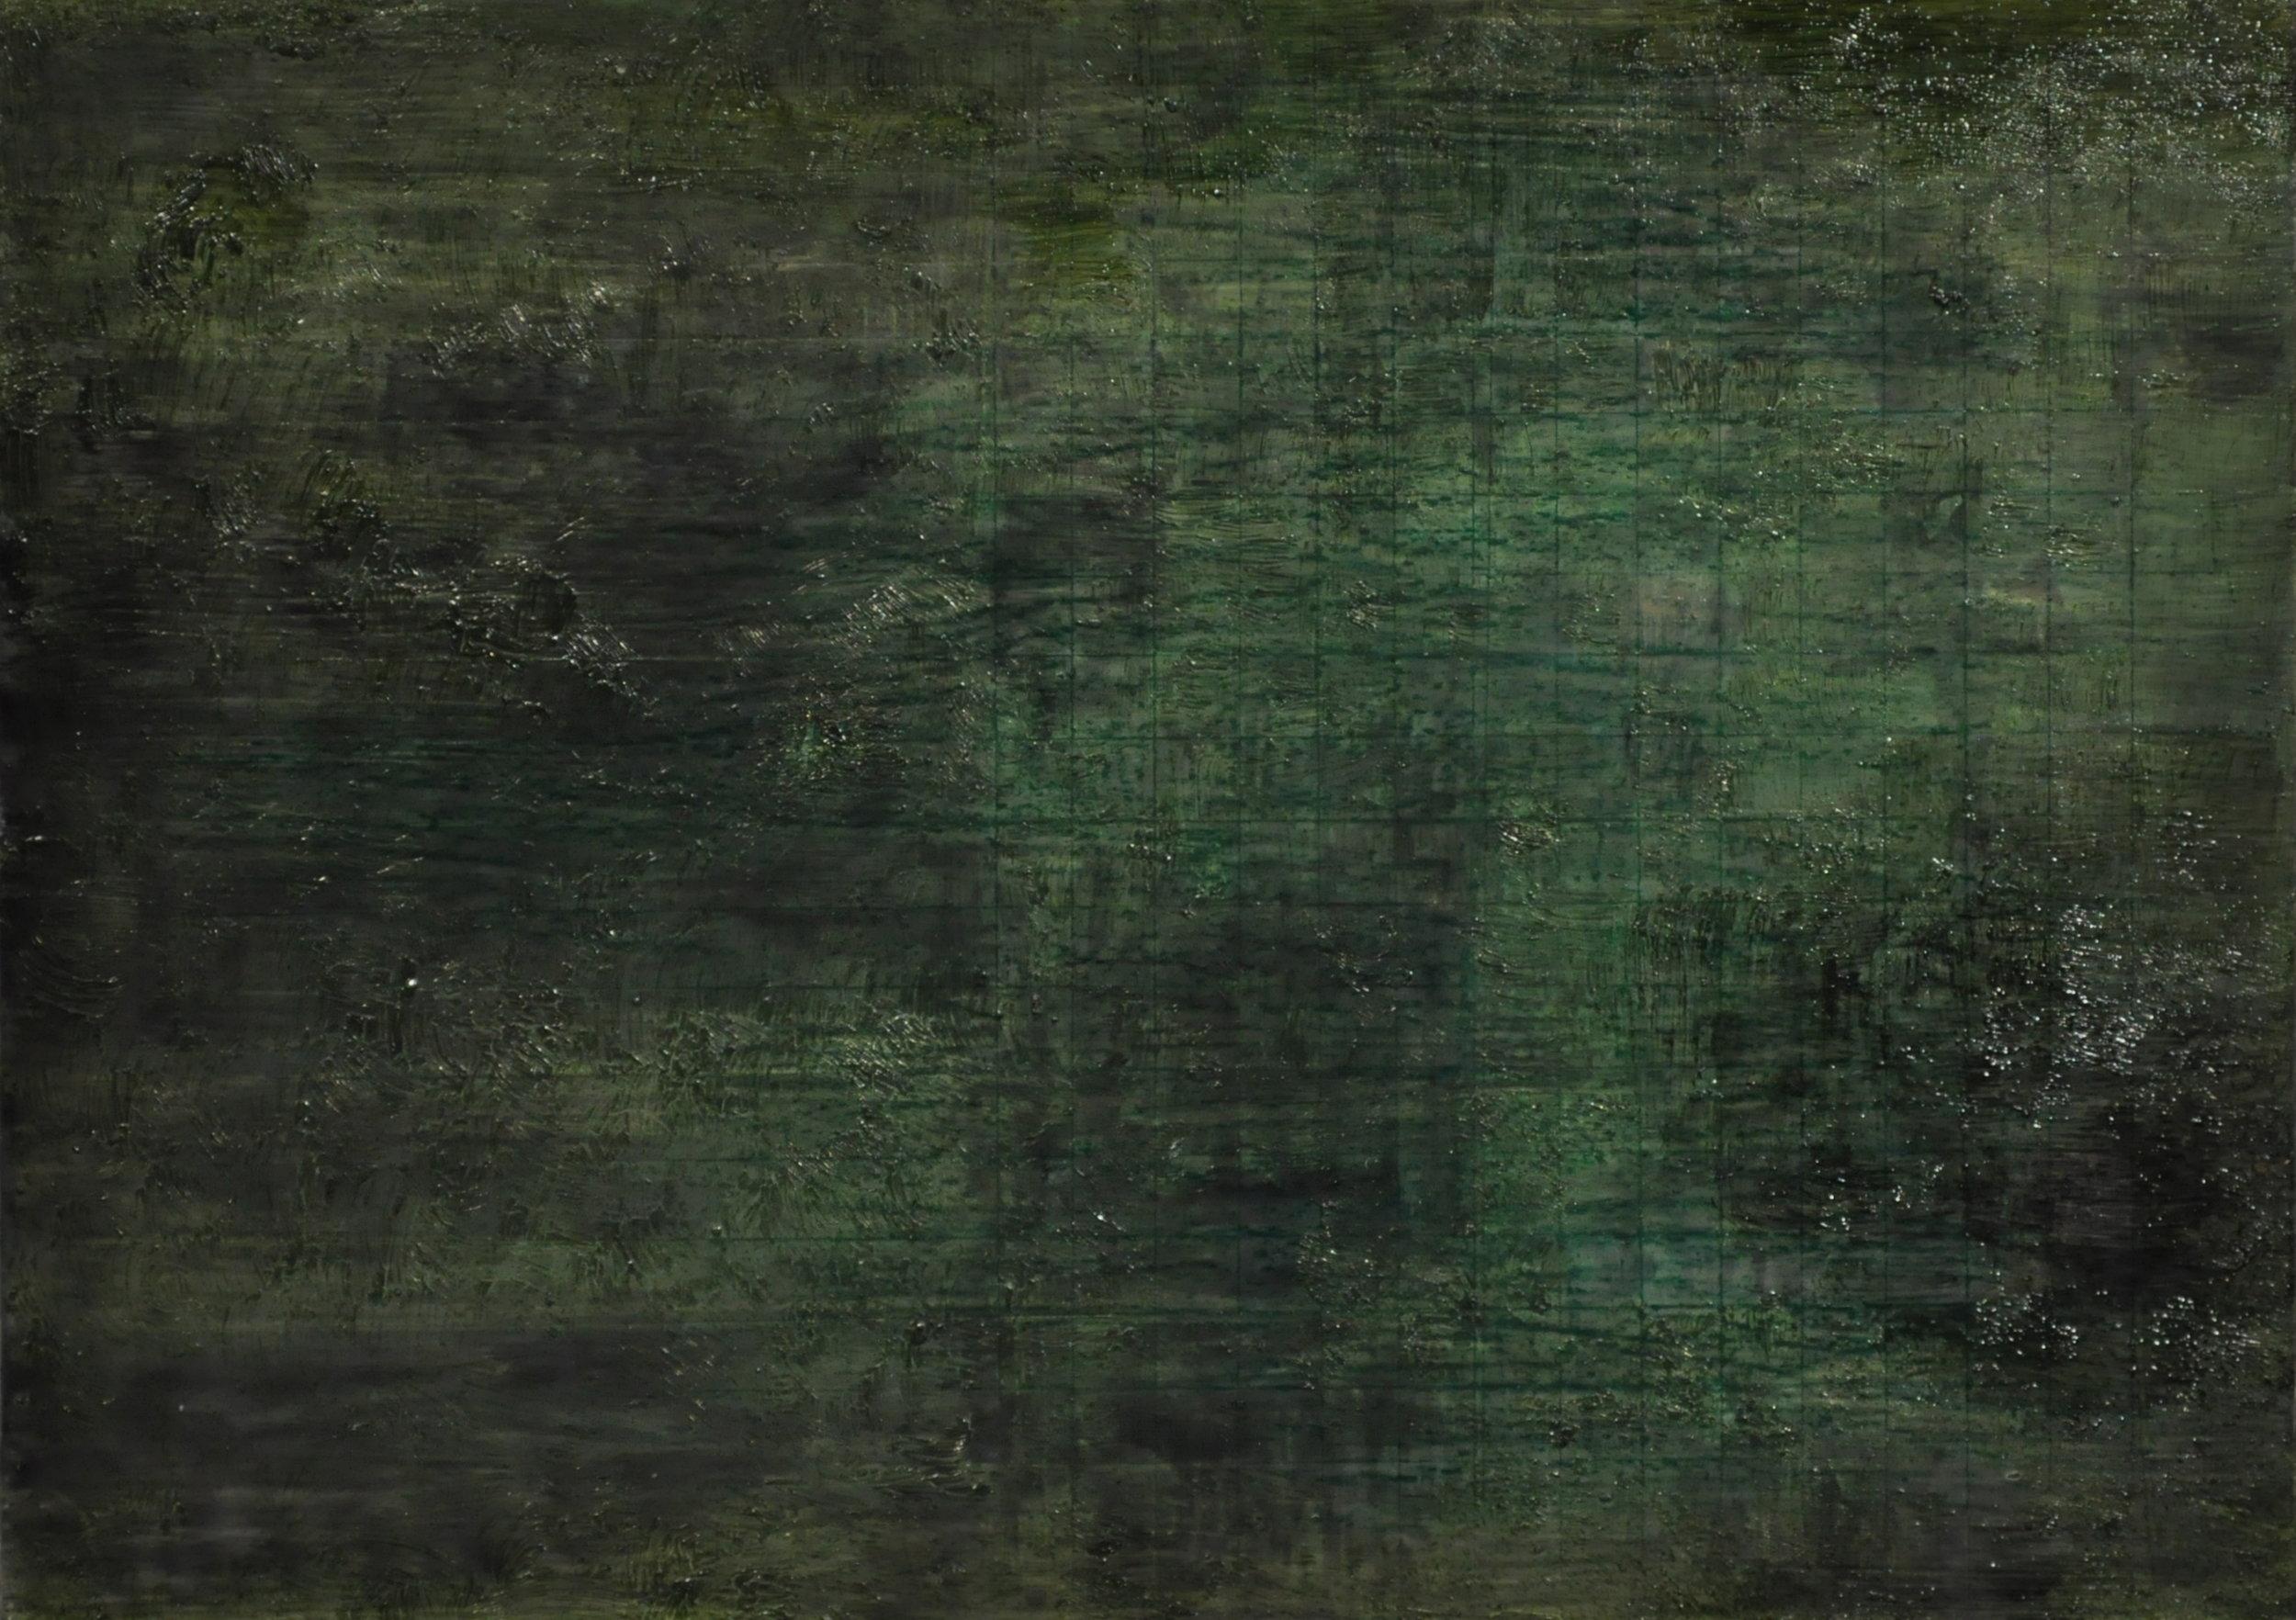 undergrowth, 2017 oil on panel, 17.7 x 12.6 cm